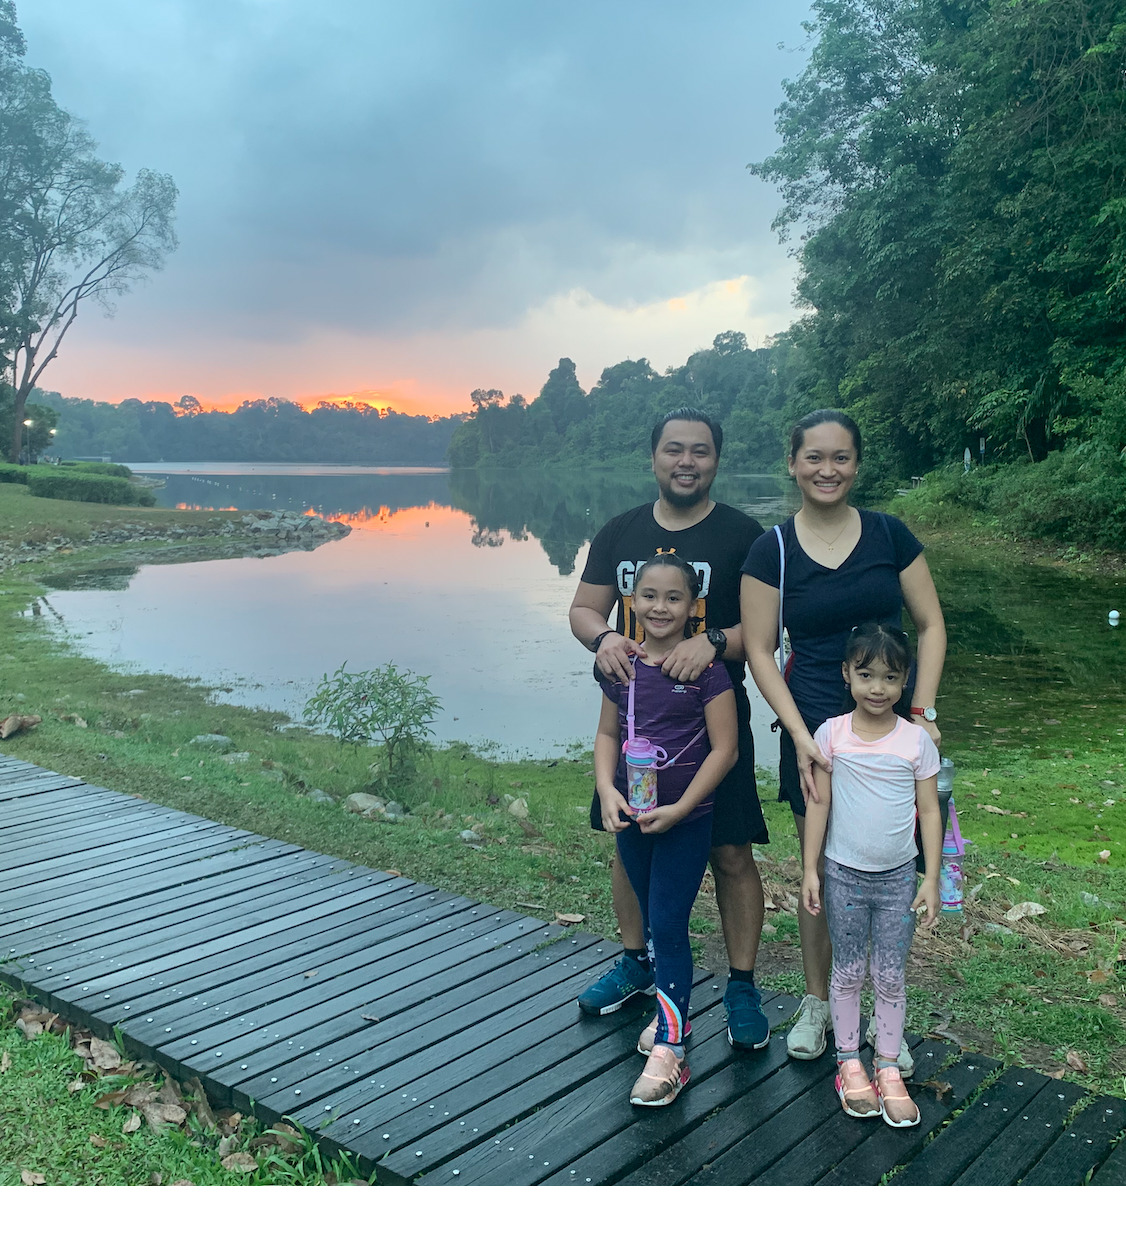 Unplanned 11km Nature Walk at MacRitchie Trail